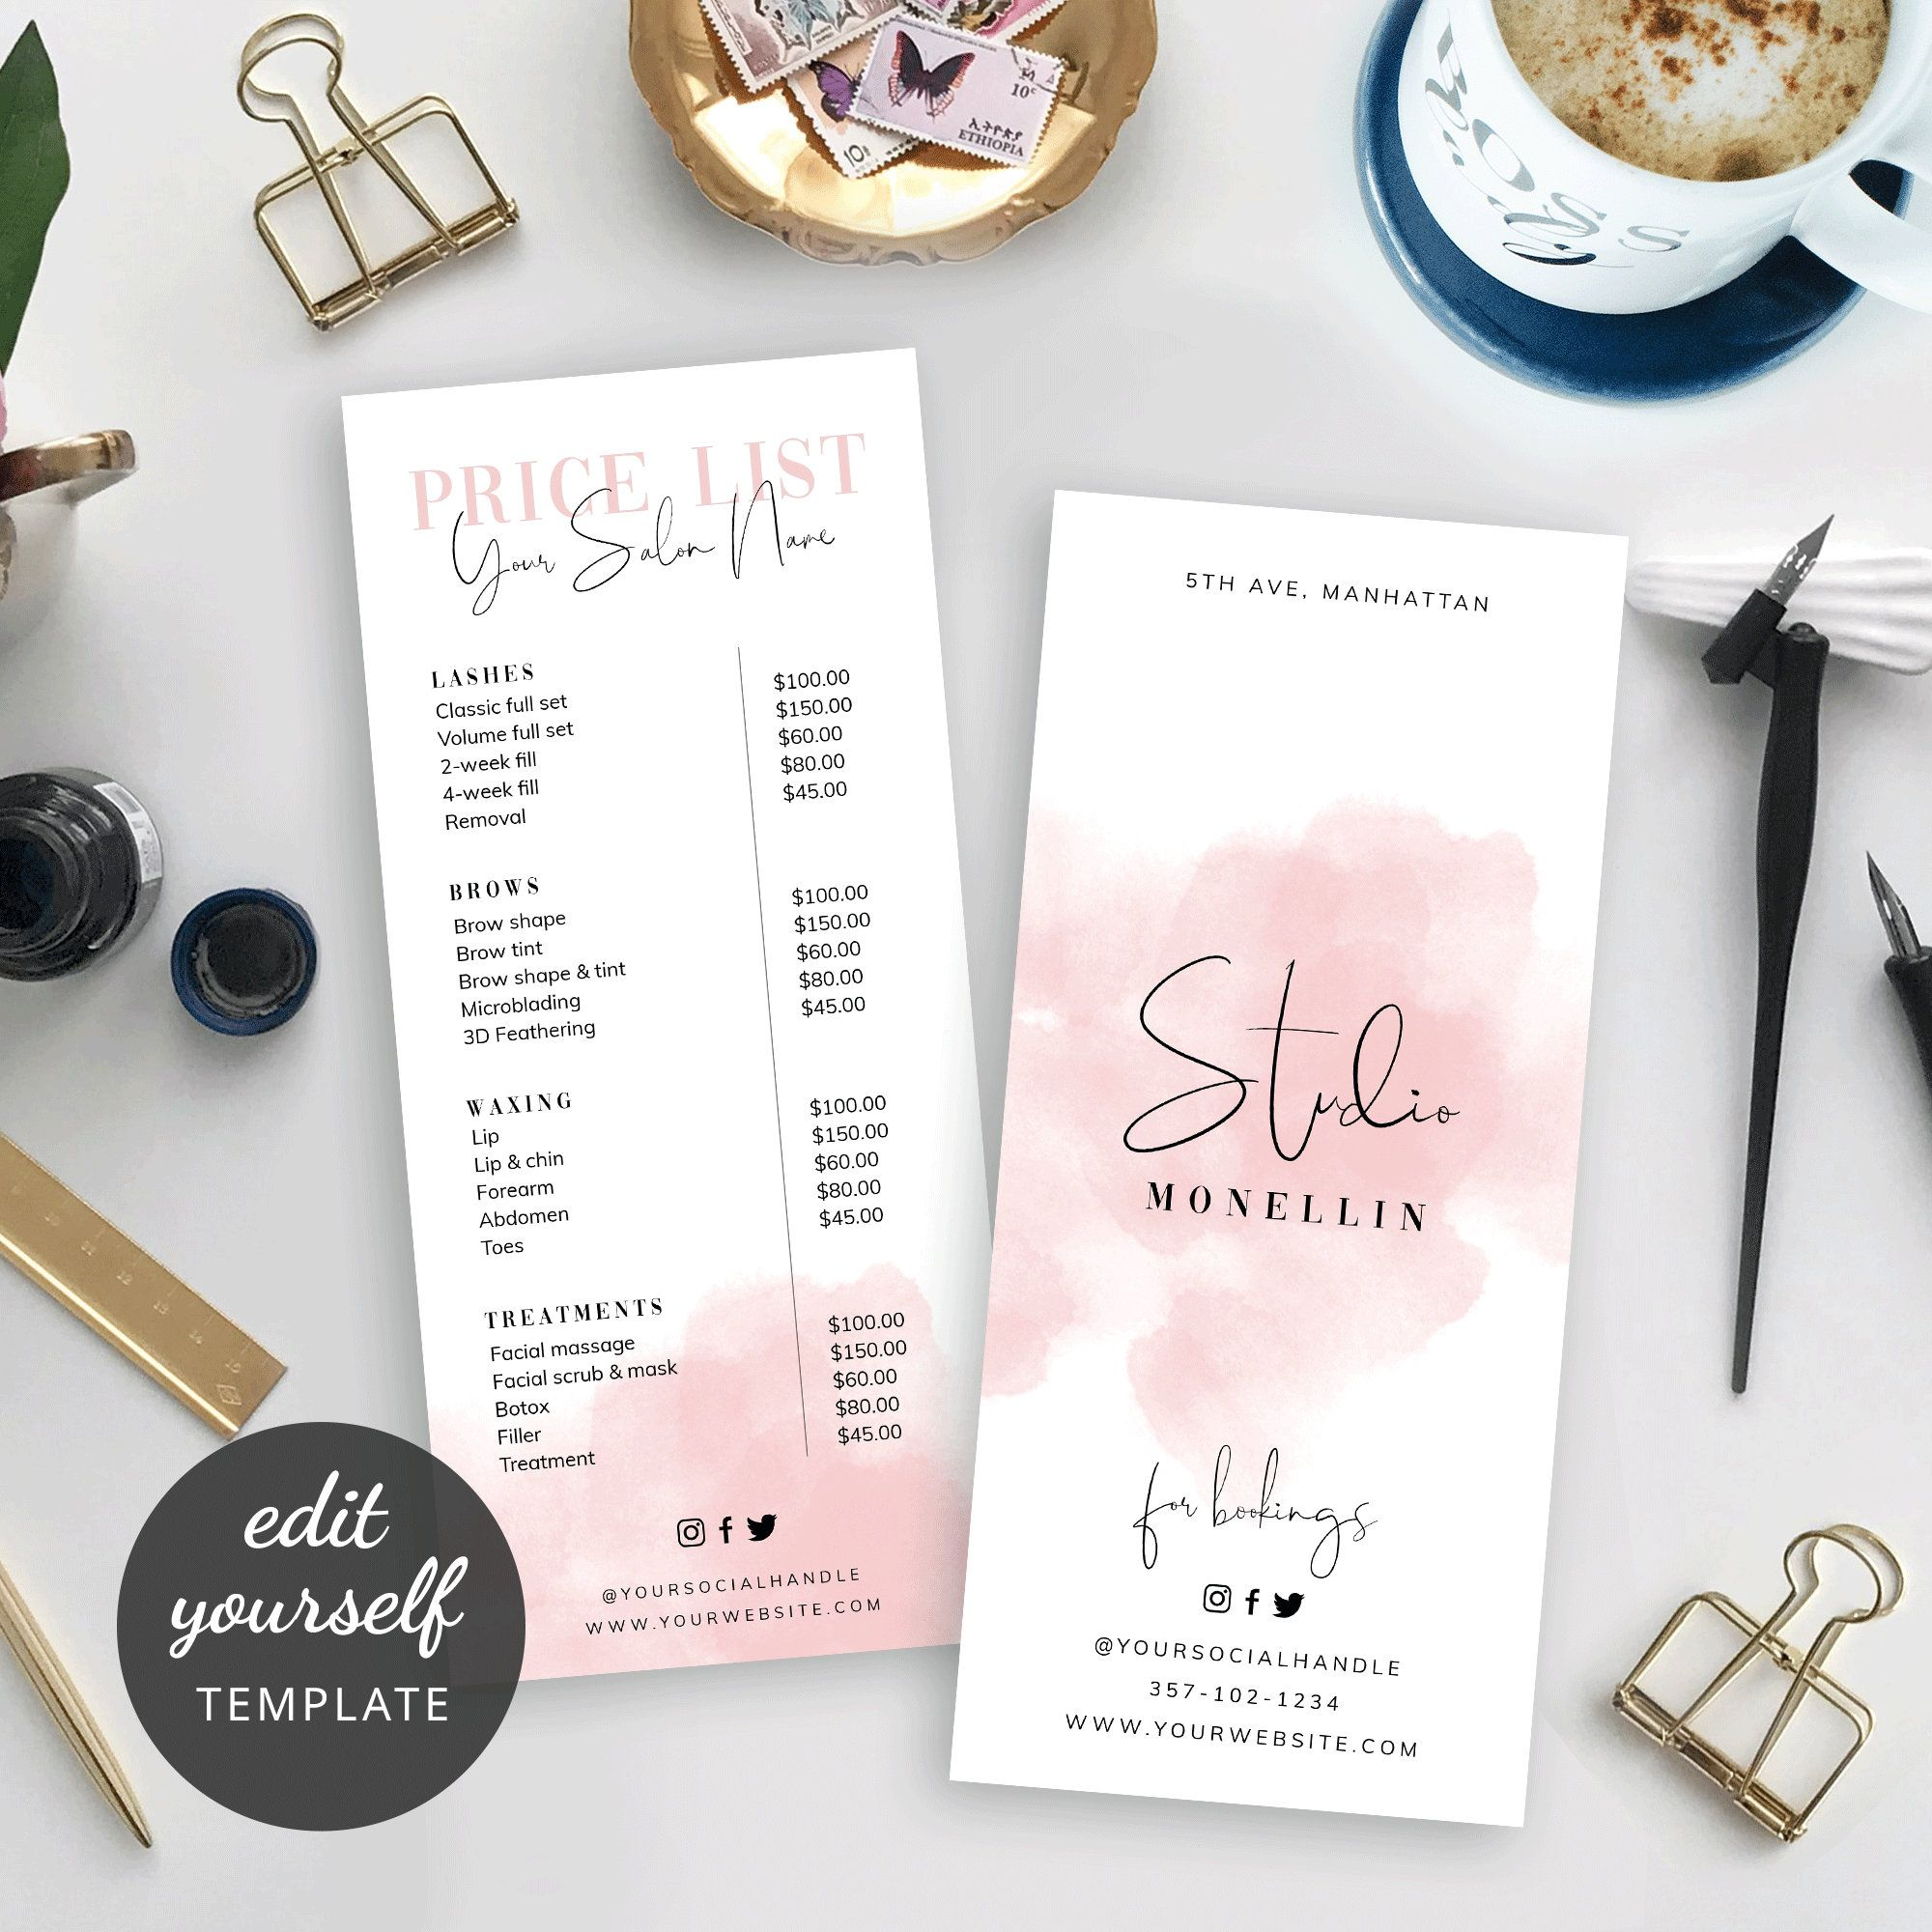 Diy Price List Template Printable Price List Design Beauty Etsy In 2020 Price List Design Photography Invoice Template List Design